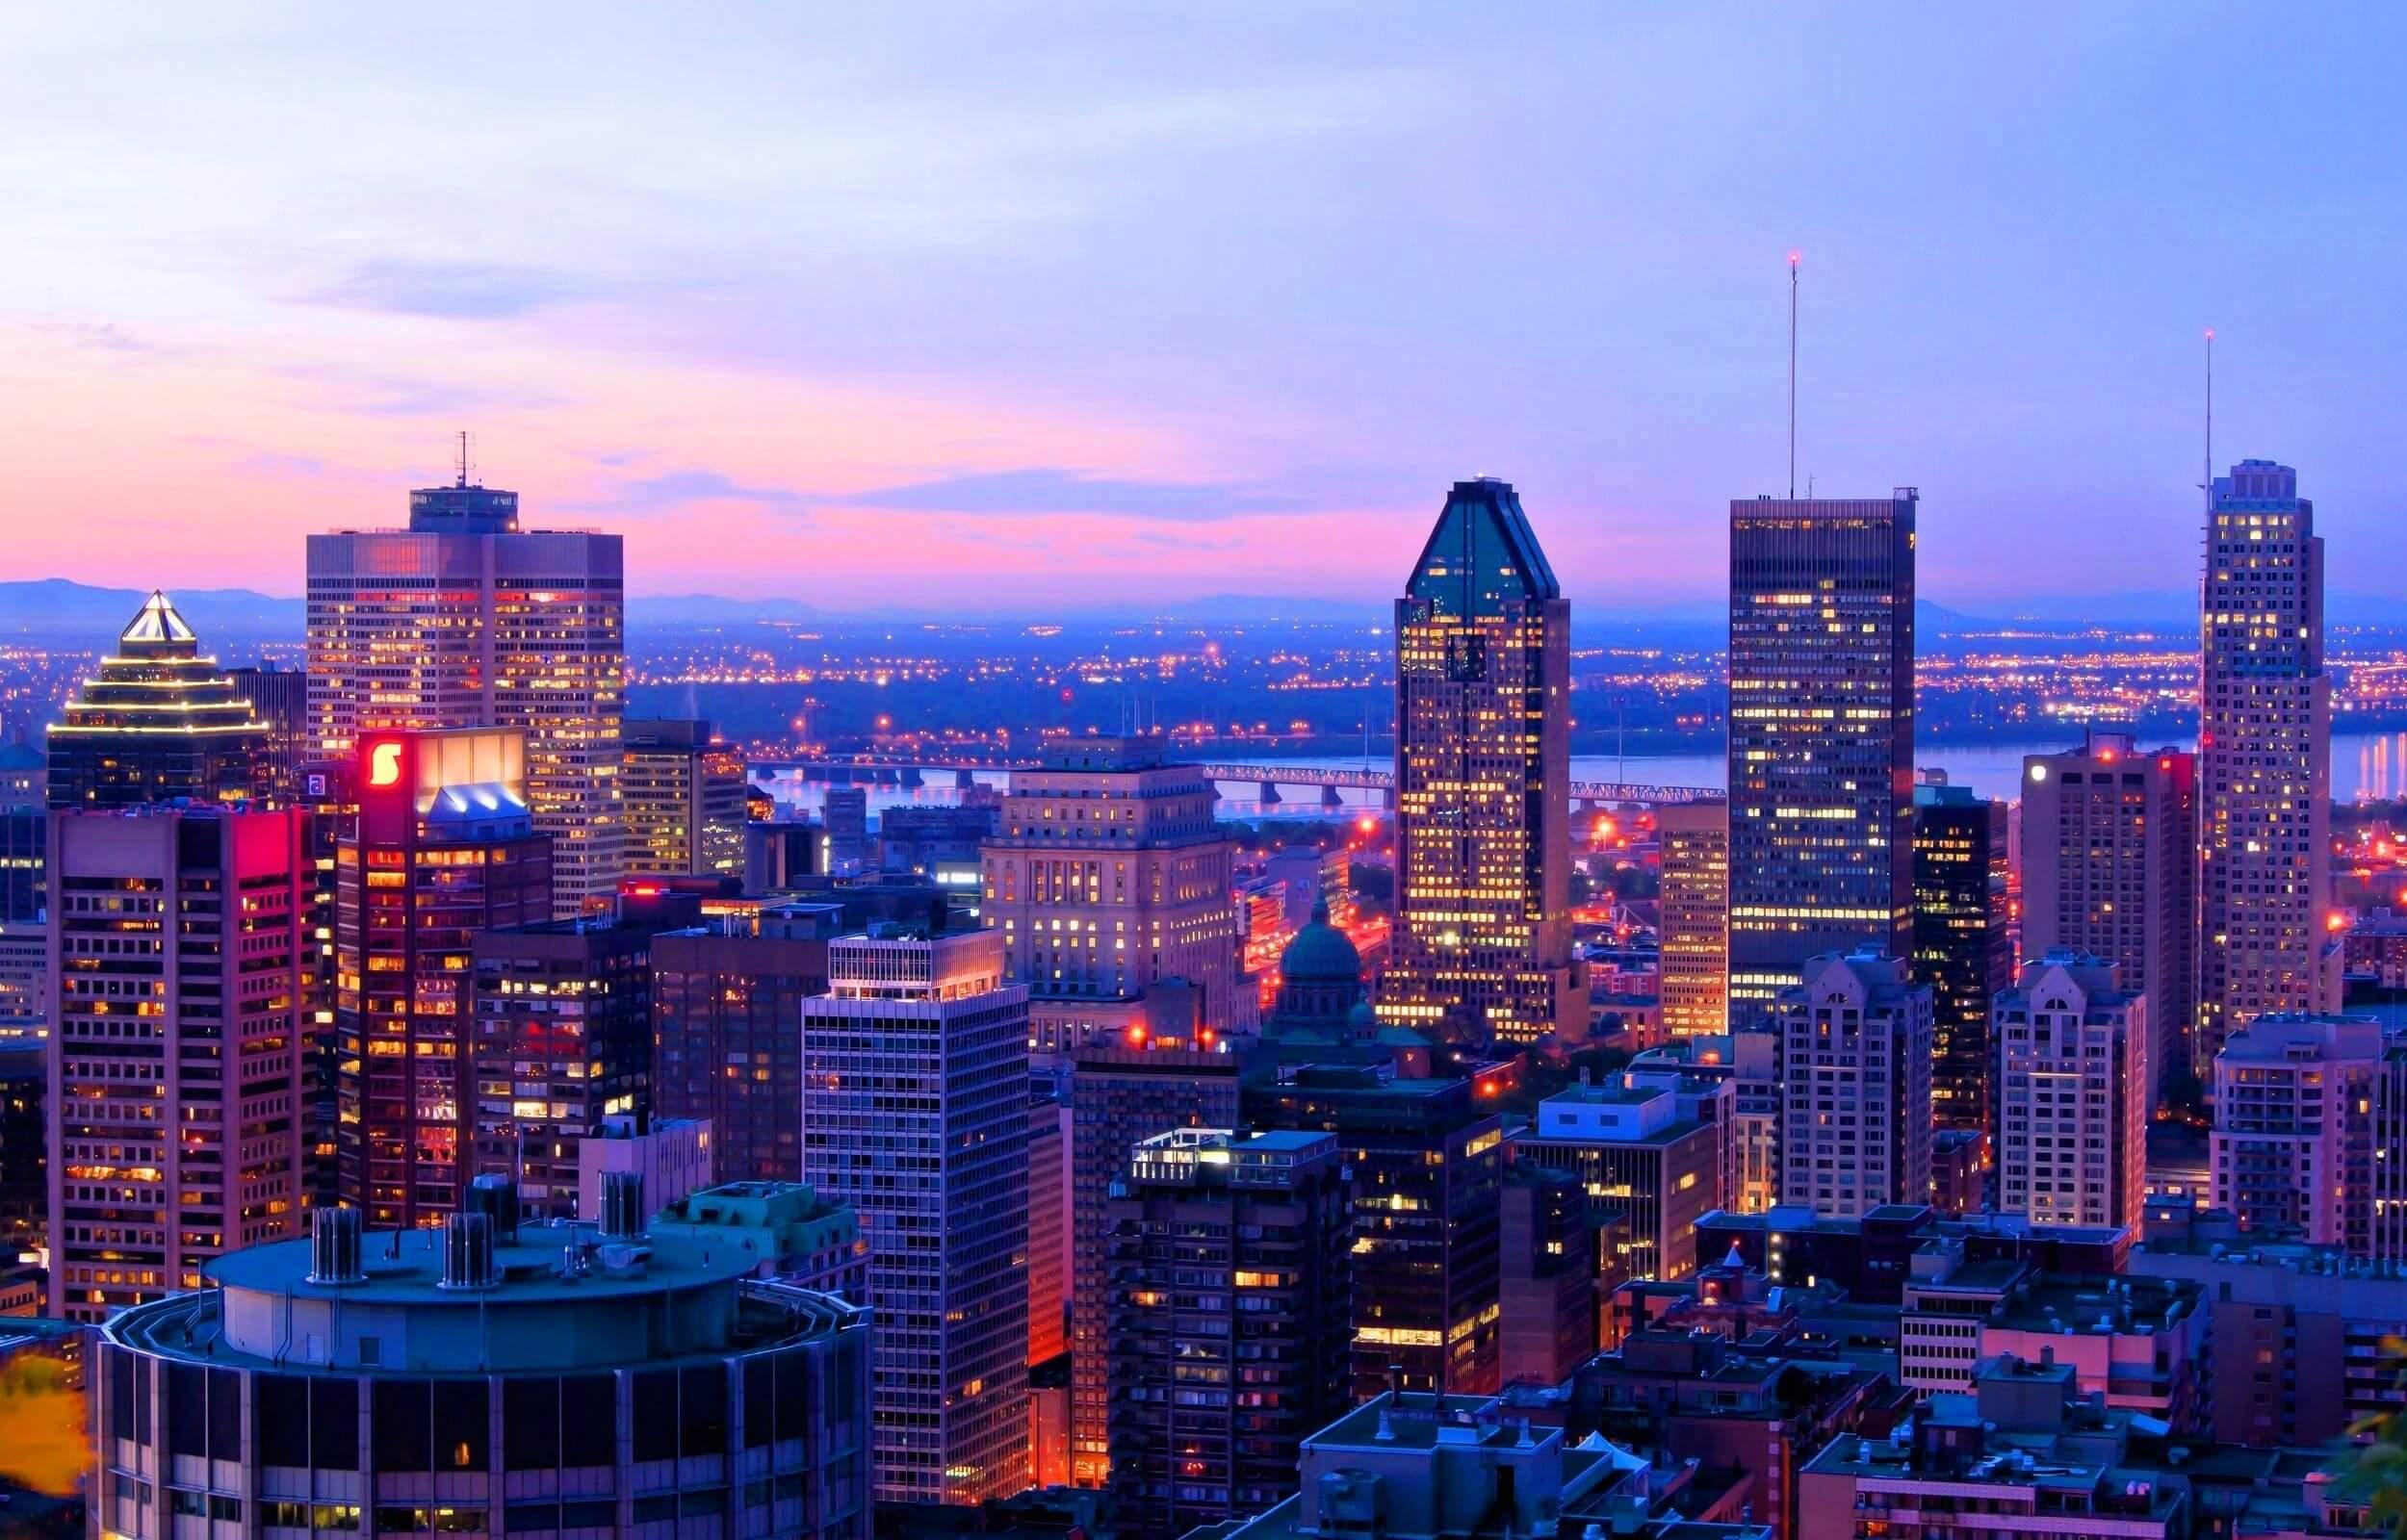 ALEIA CANADA BUILDINGS SKYSCAPER LIGHT CITY